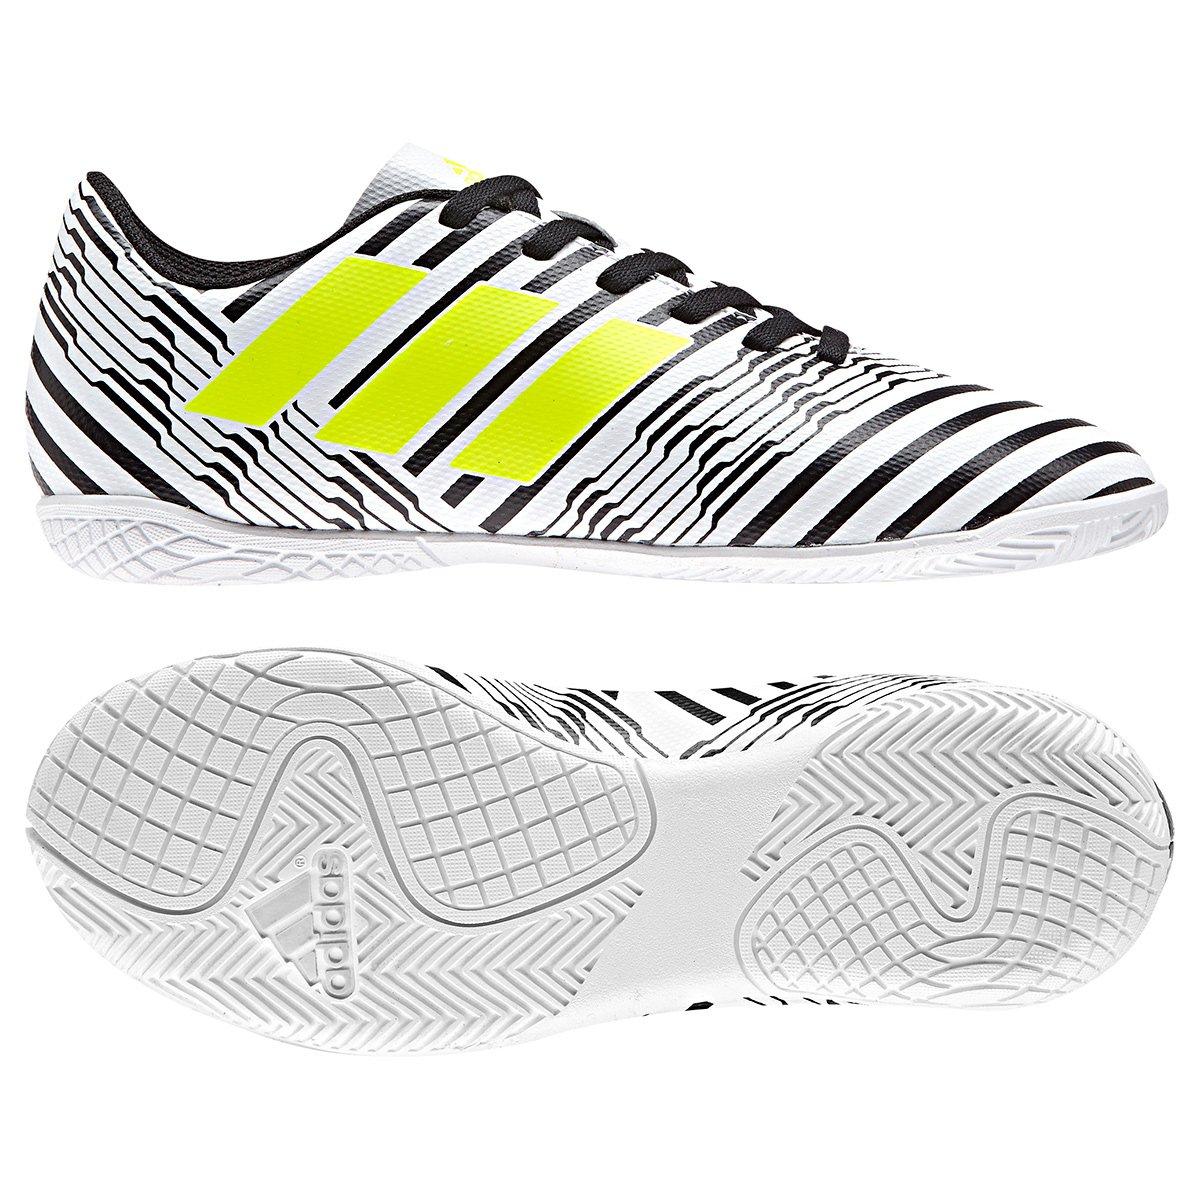 7708af697e Chuteira Futsal Infantil Adidas Nemeziz 17.4 IN - Compre Agora